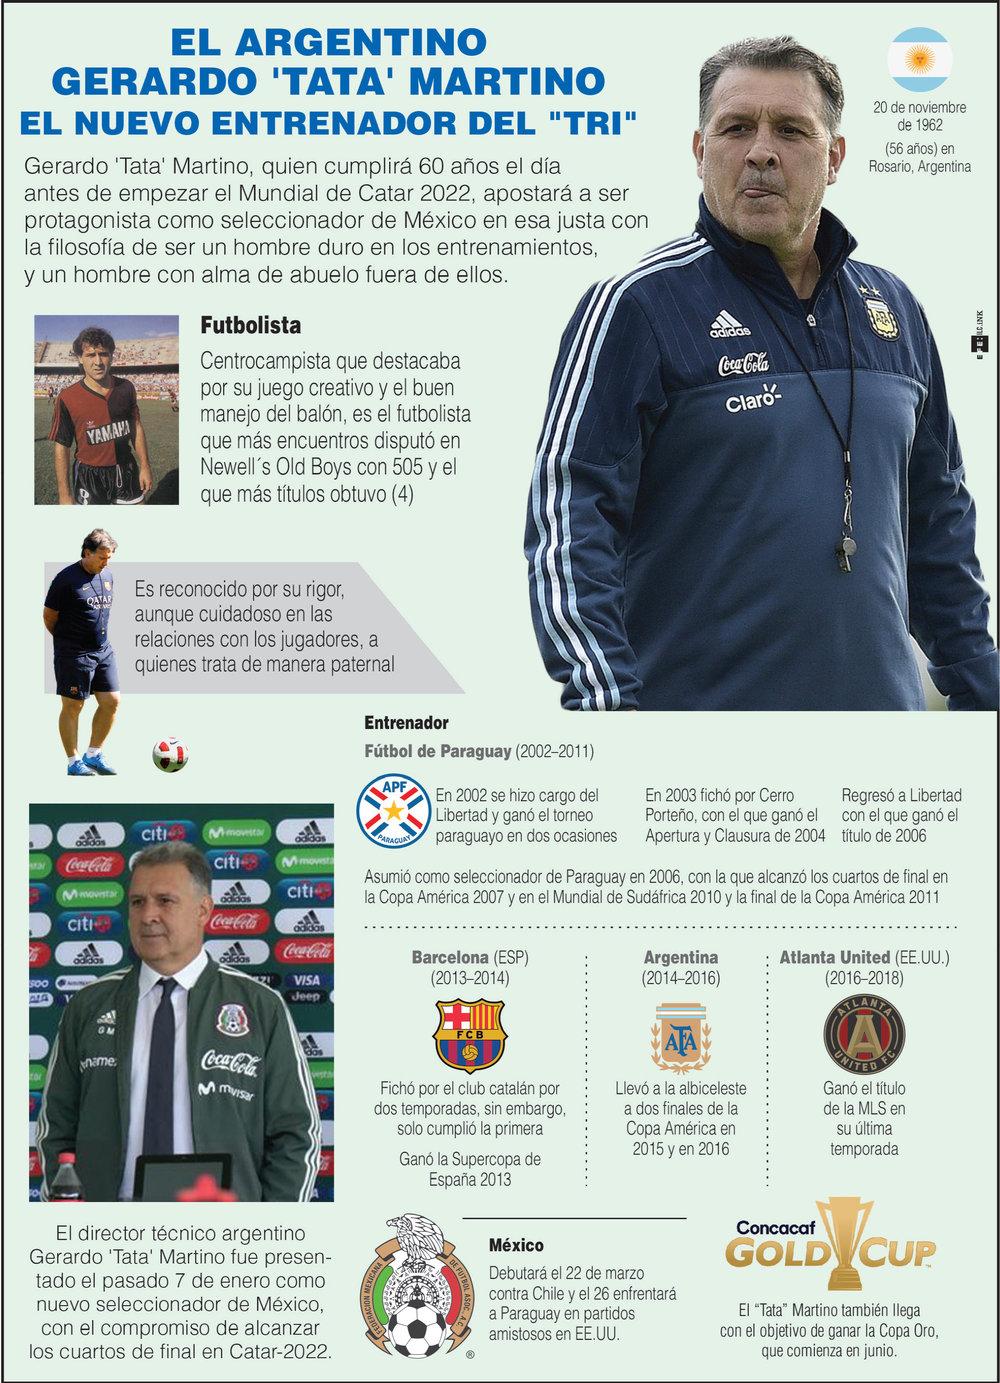 infografia Tata martino - deportes - FEB 2019.jpg